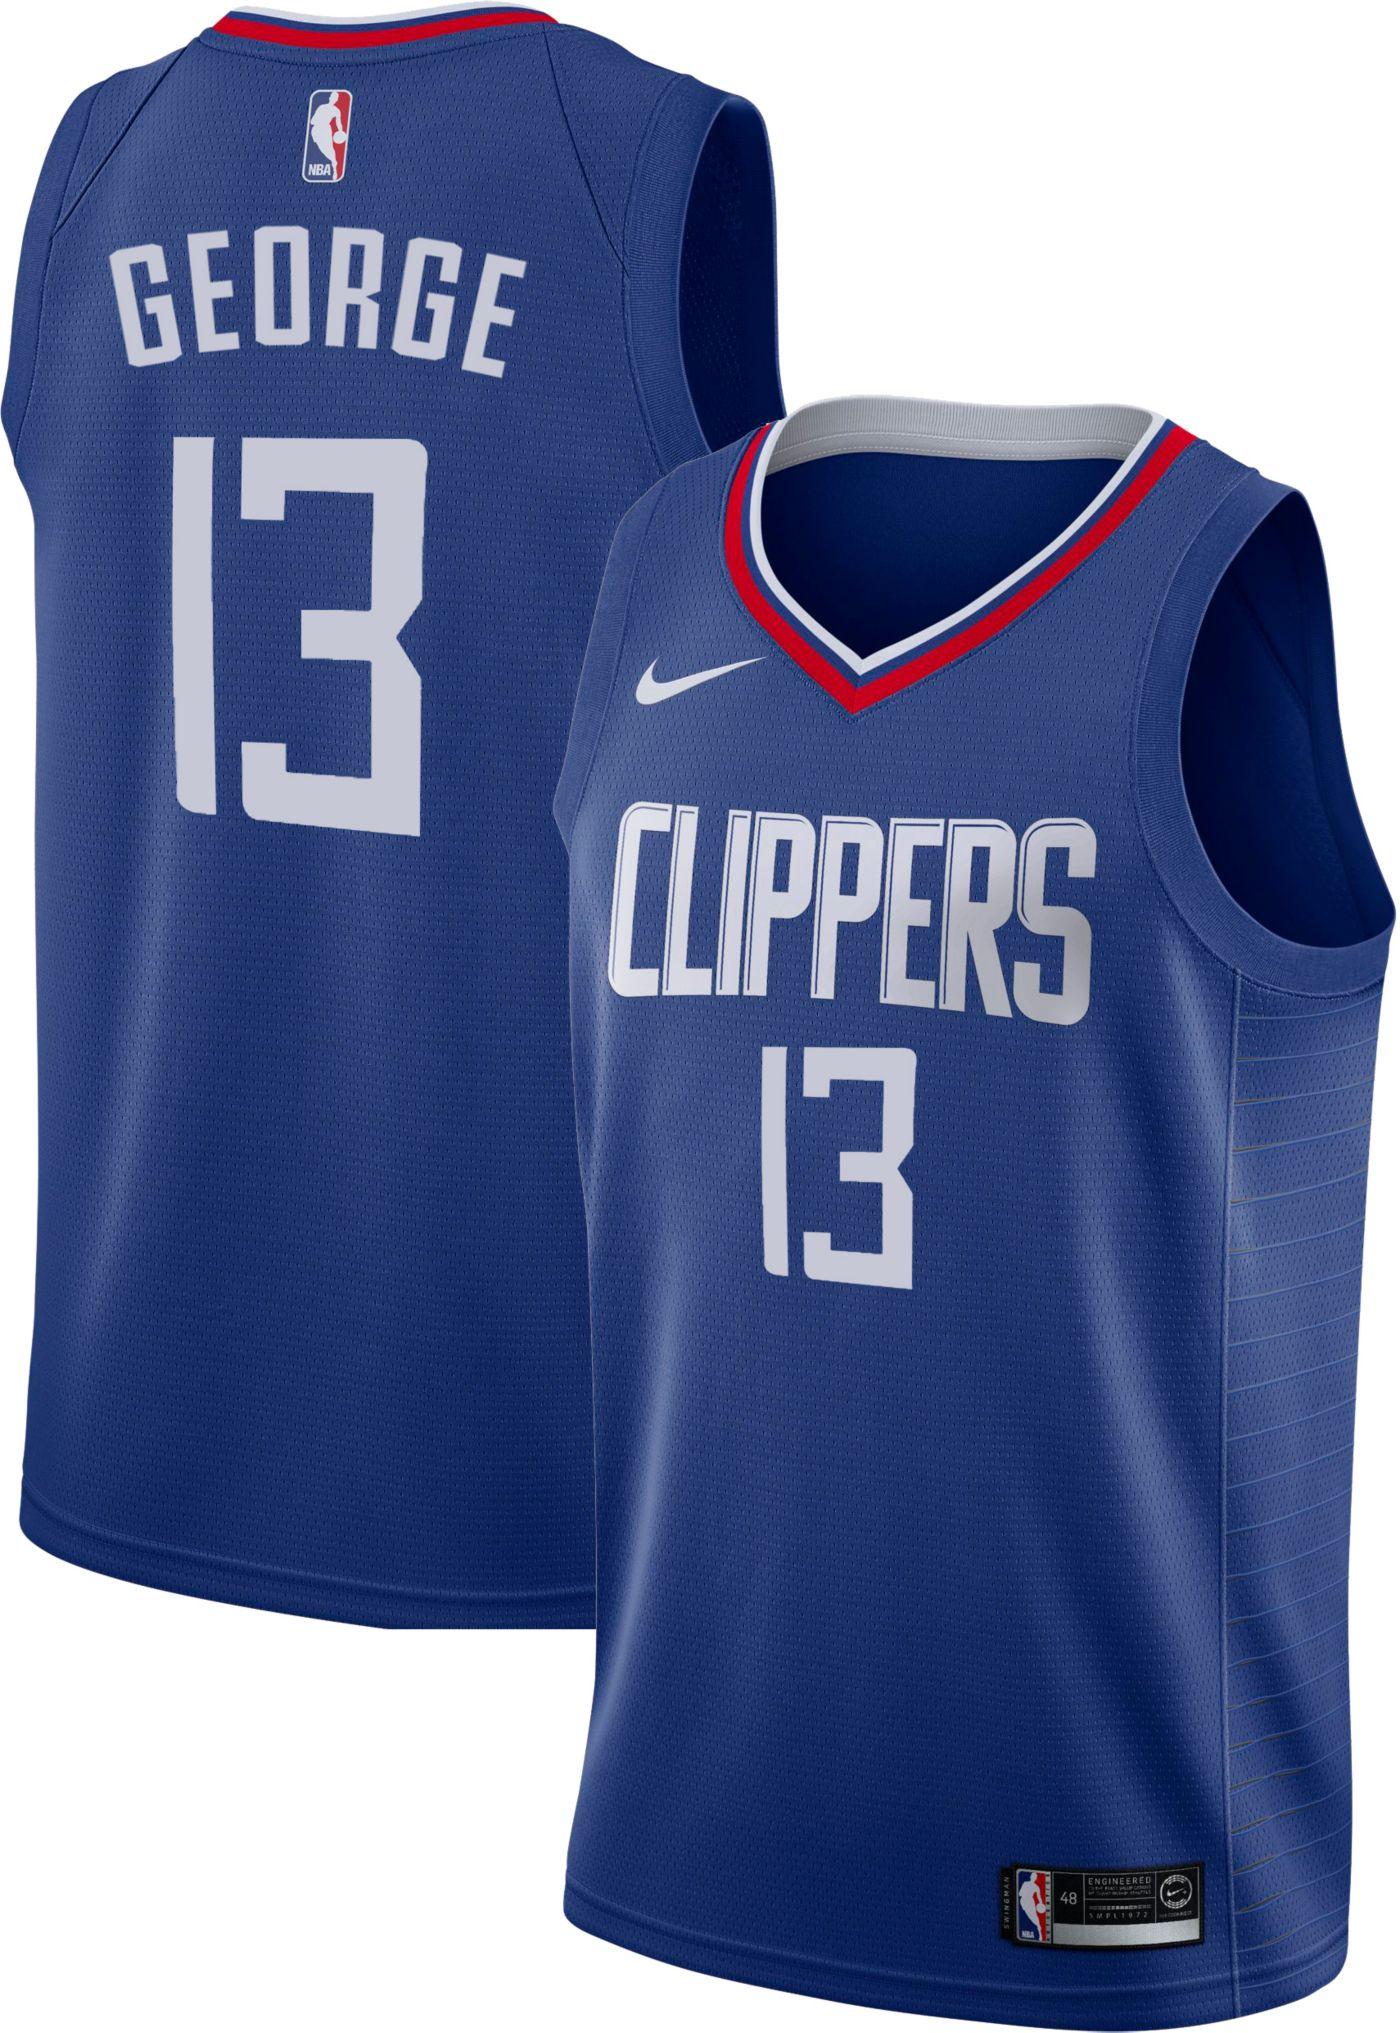 Nike Men's Los Angeles Clippers Paul George #13 Royal Dri-FIT Swingman Jersey